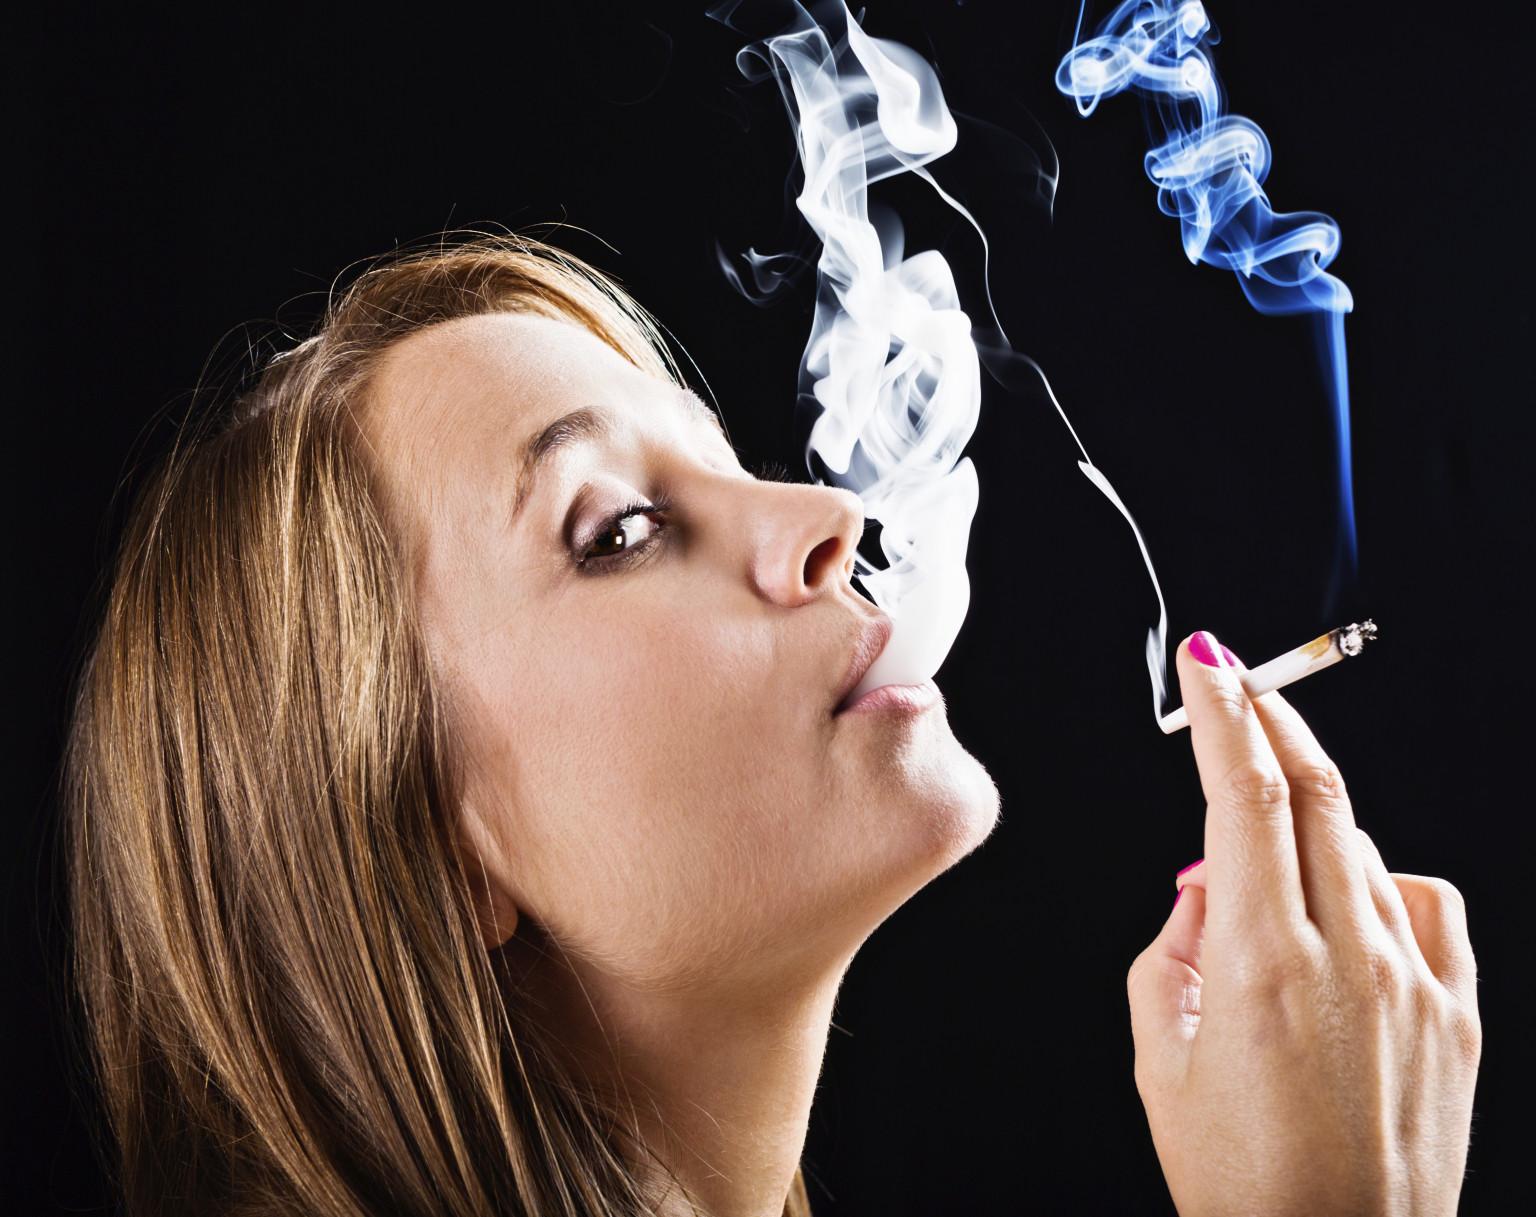 Што е поопасно – марихуана или алкохол?